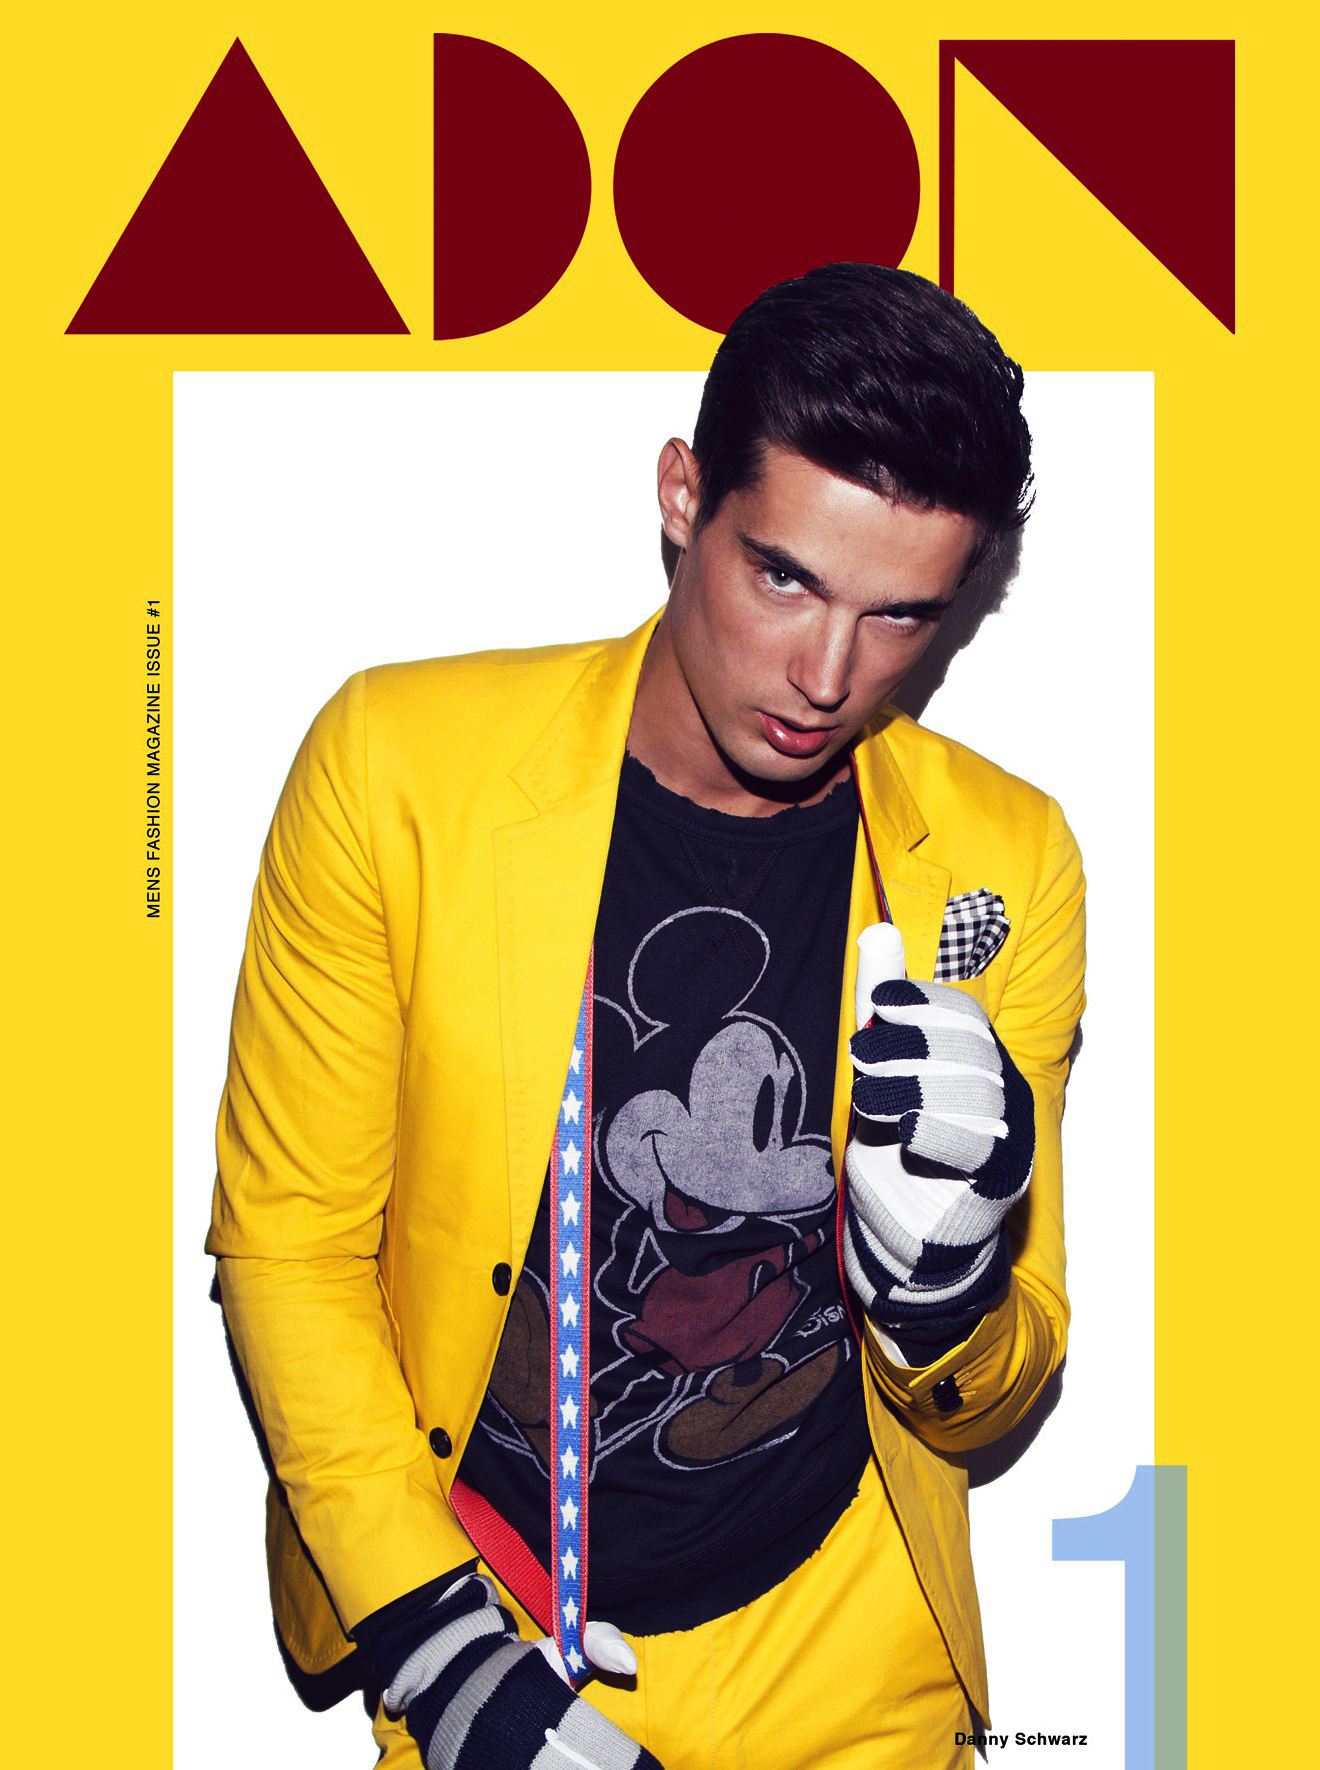 Danny-Schwarz-ADON-Magazine-cover-november-2012.jpg